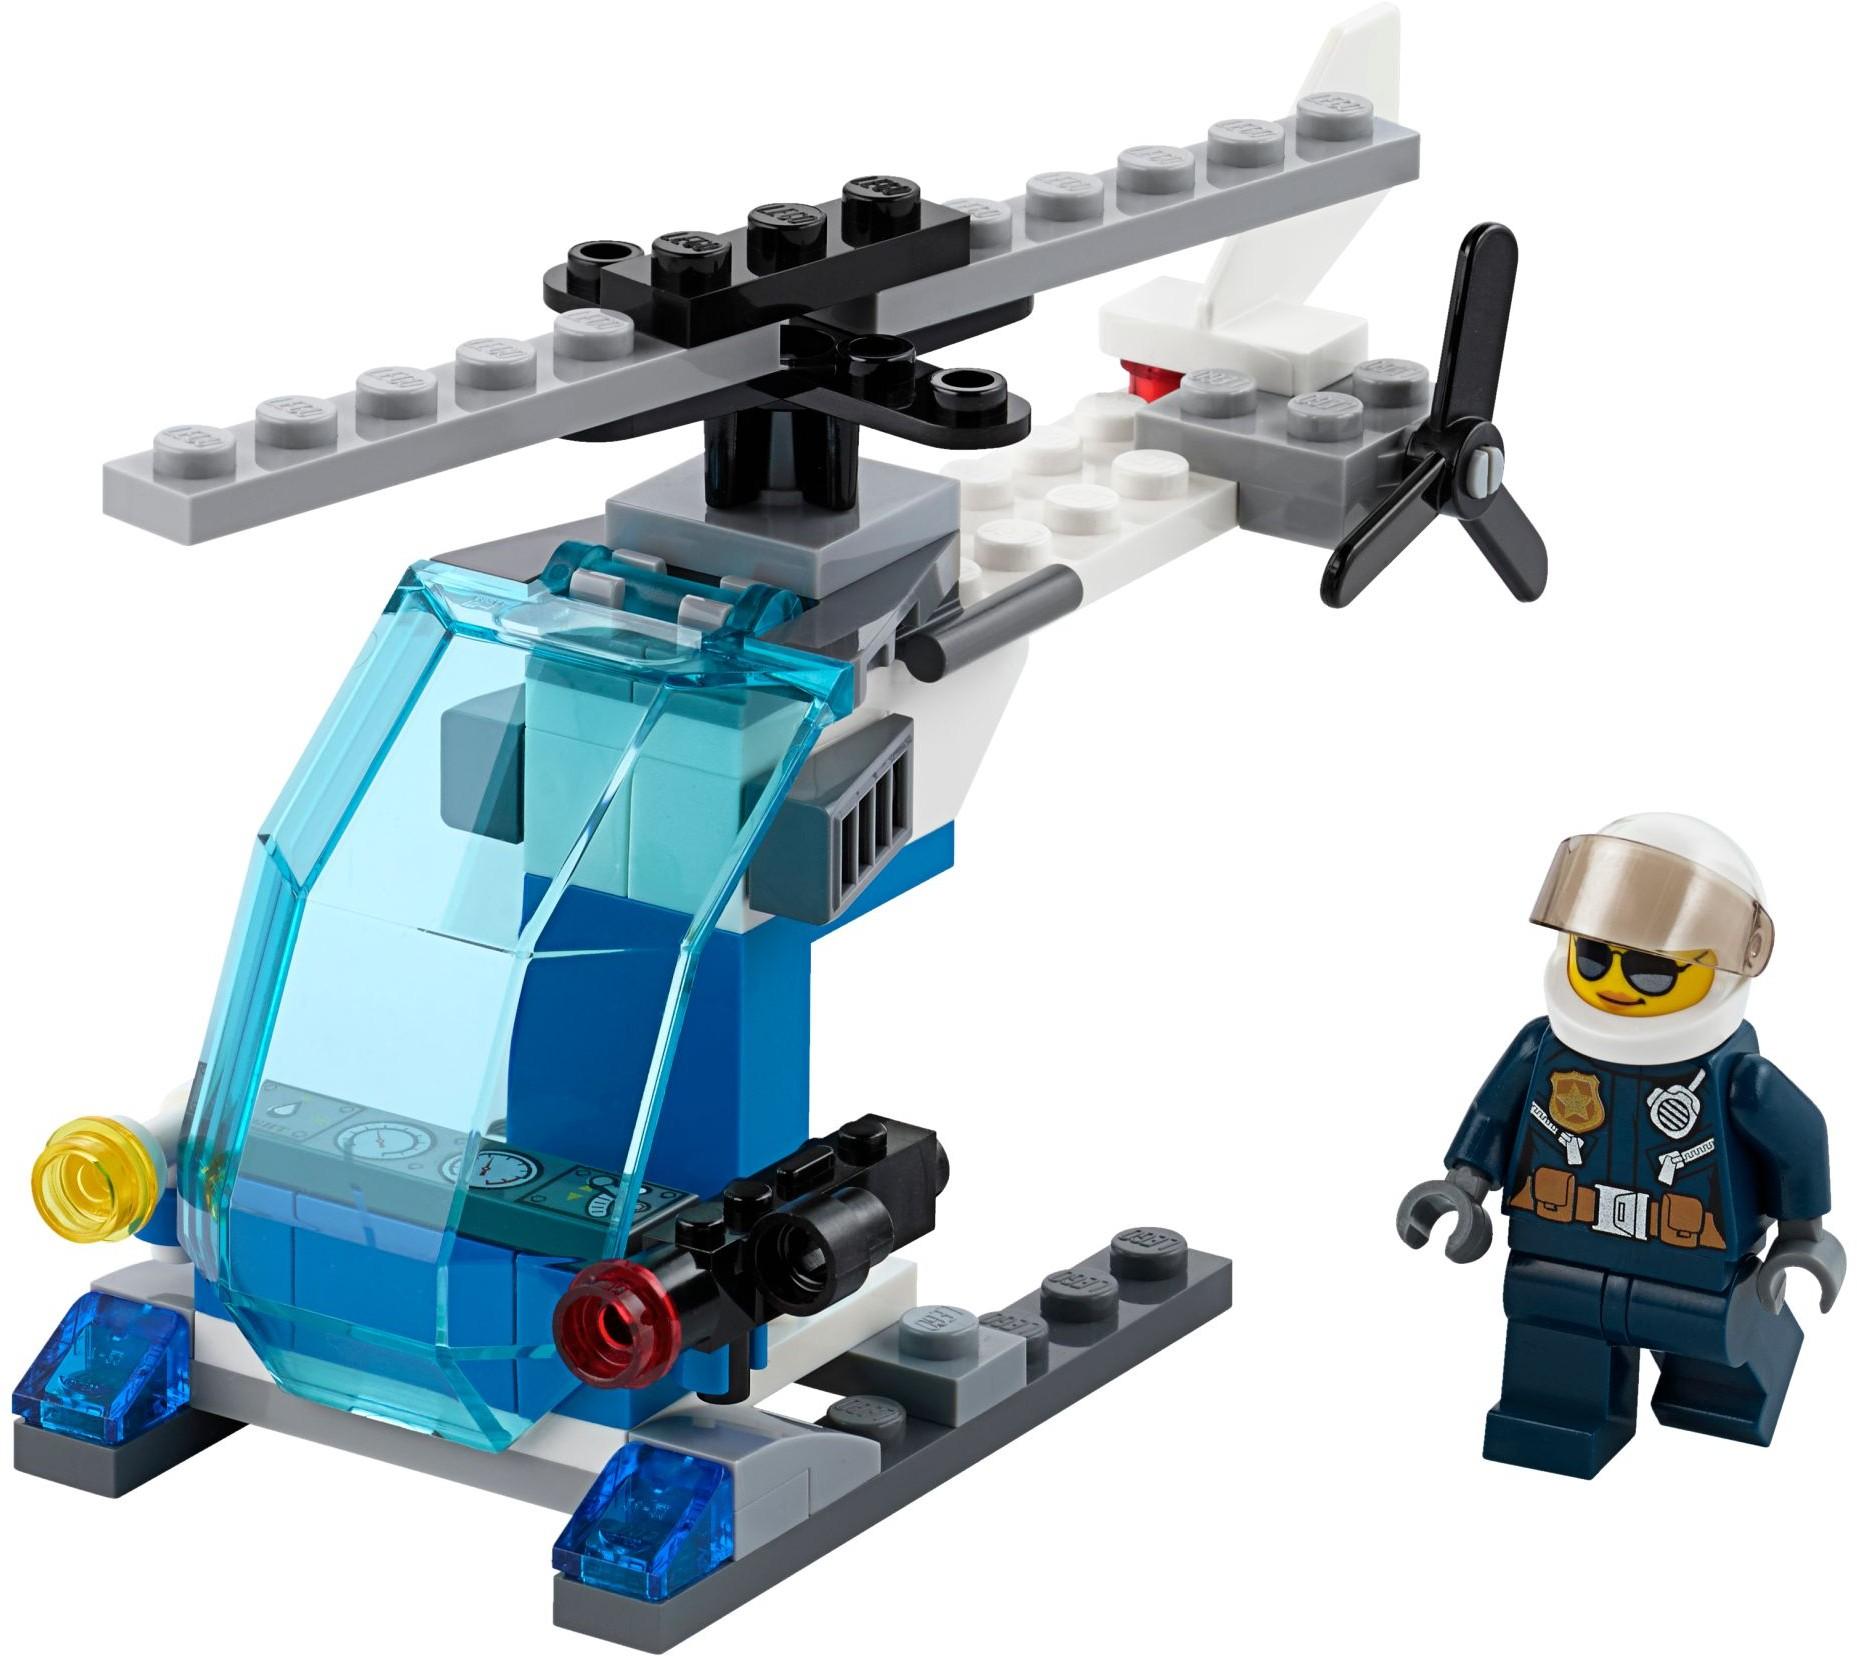 2017 Tagged Polybag Brickset Lego Set Guide And Database